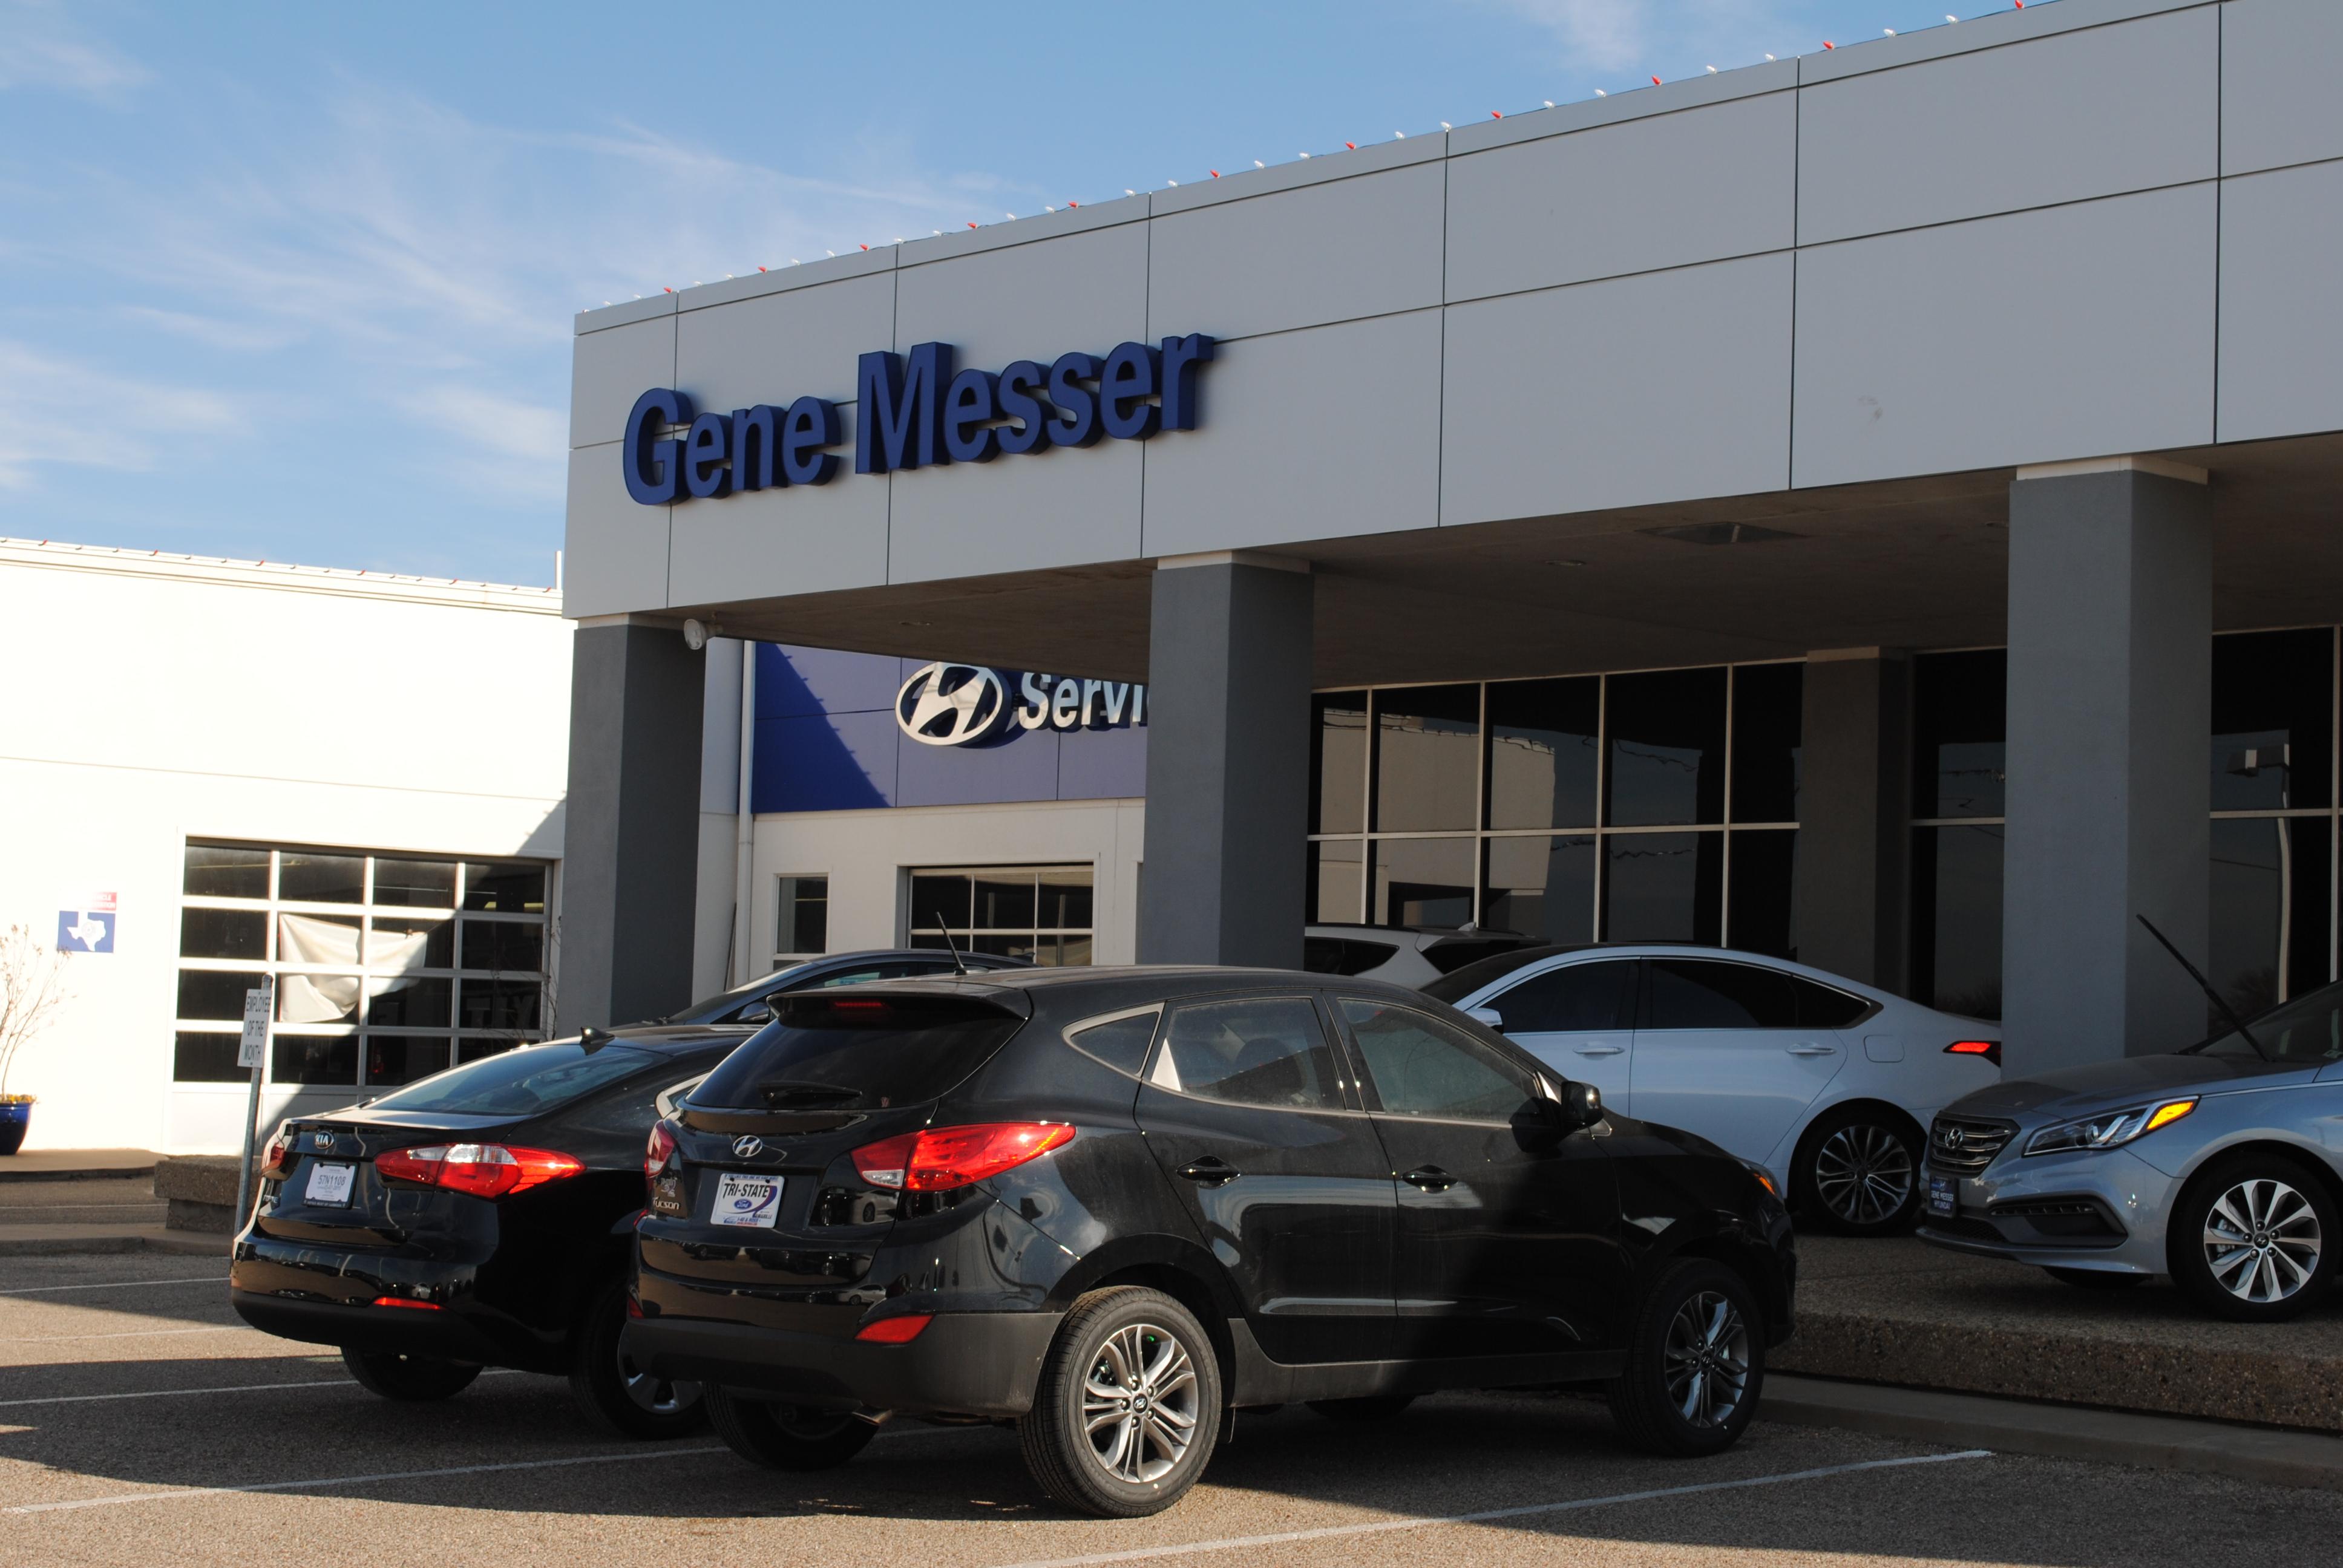 Gene Messer Chevrolet Service